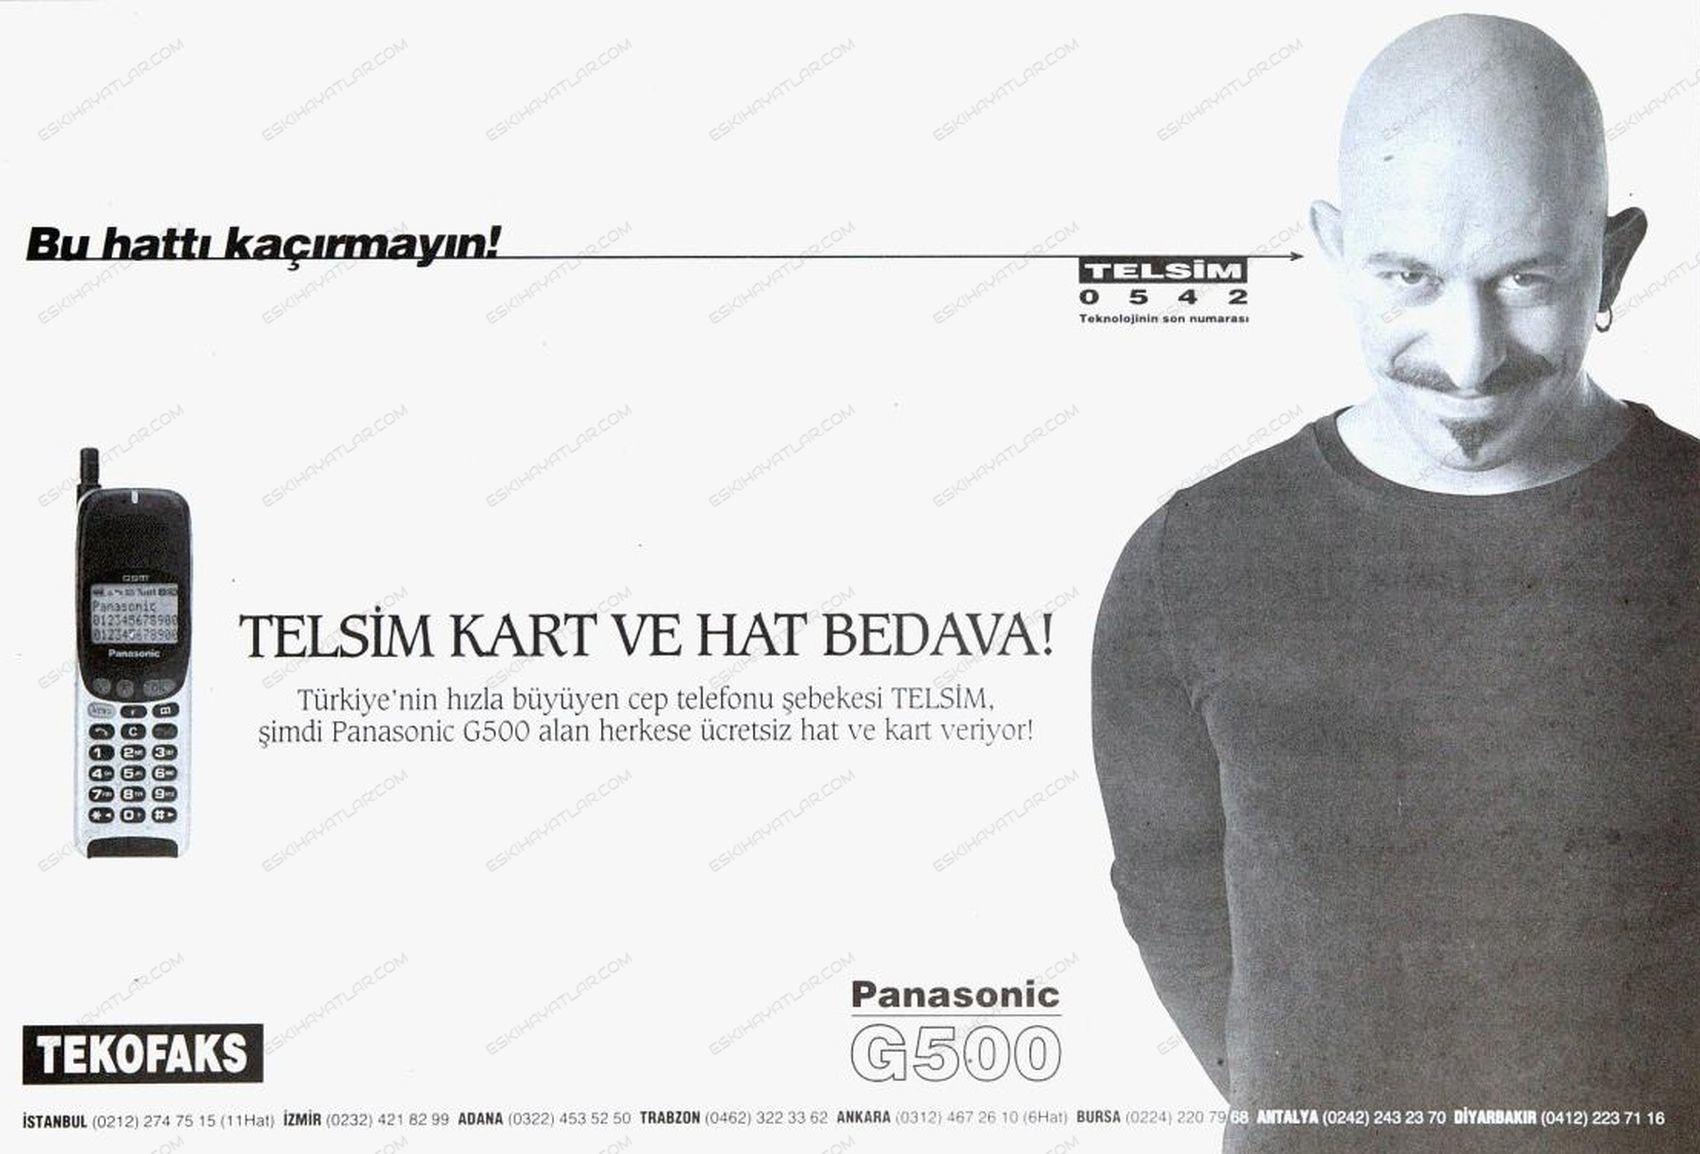 0334-cem-yilmaz-g500-panasonic-reklami-telsim-kart-bedava